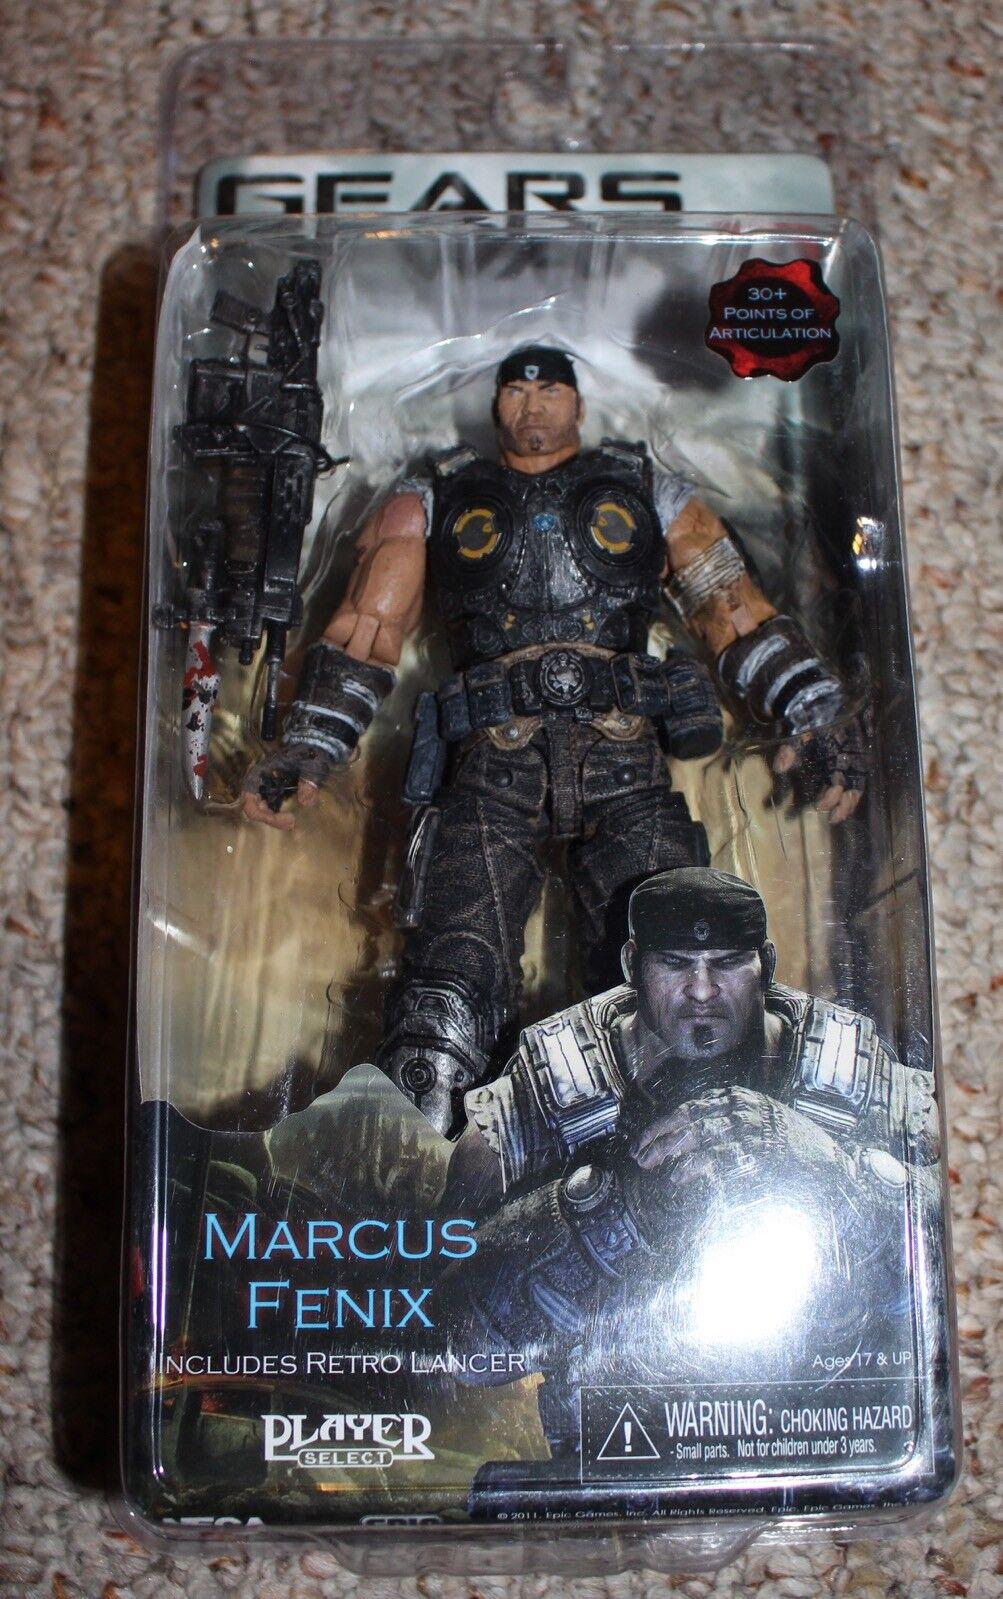 Gears Of War 3 Marcus Marcus Marcus Fenix Includes Retro Lancer Player Select Figure NEW 3de8dc